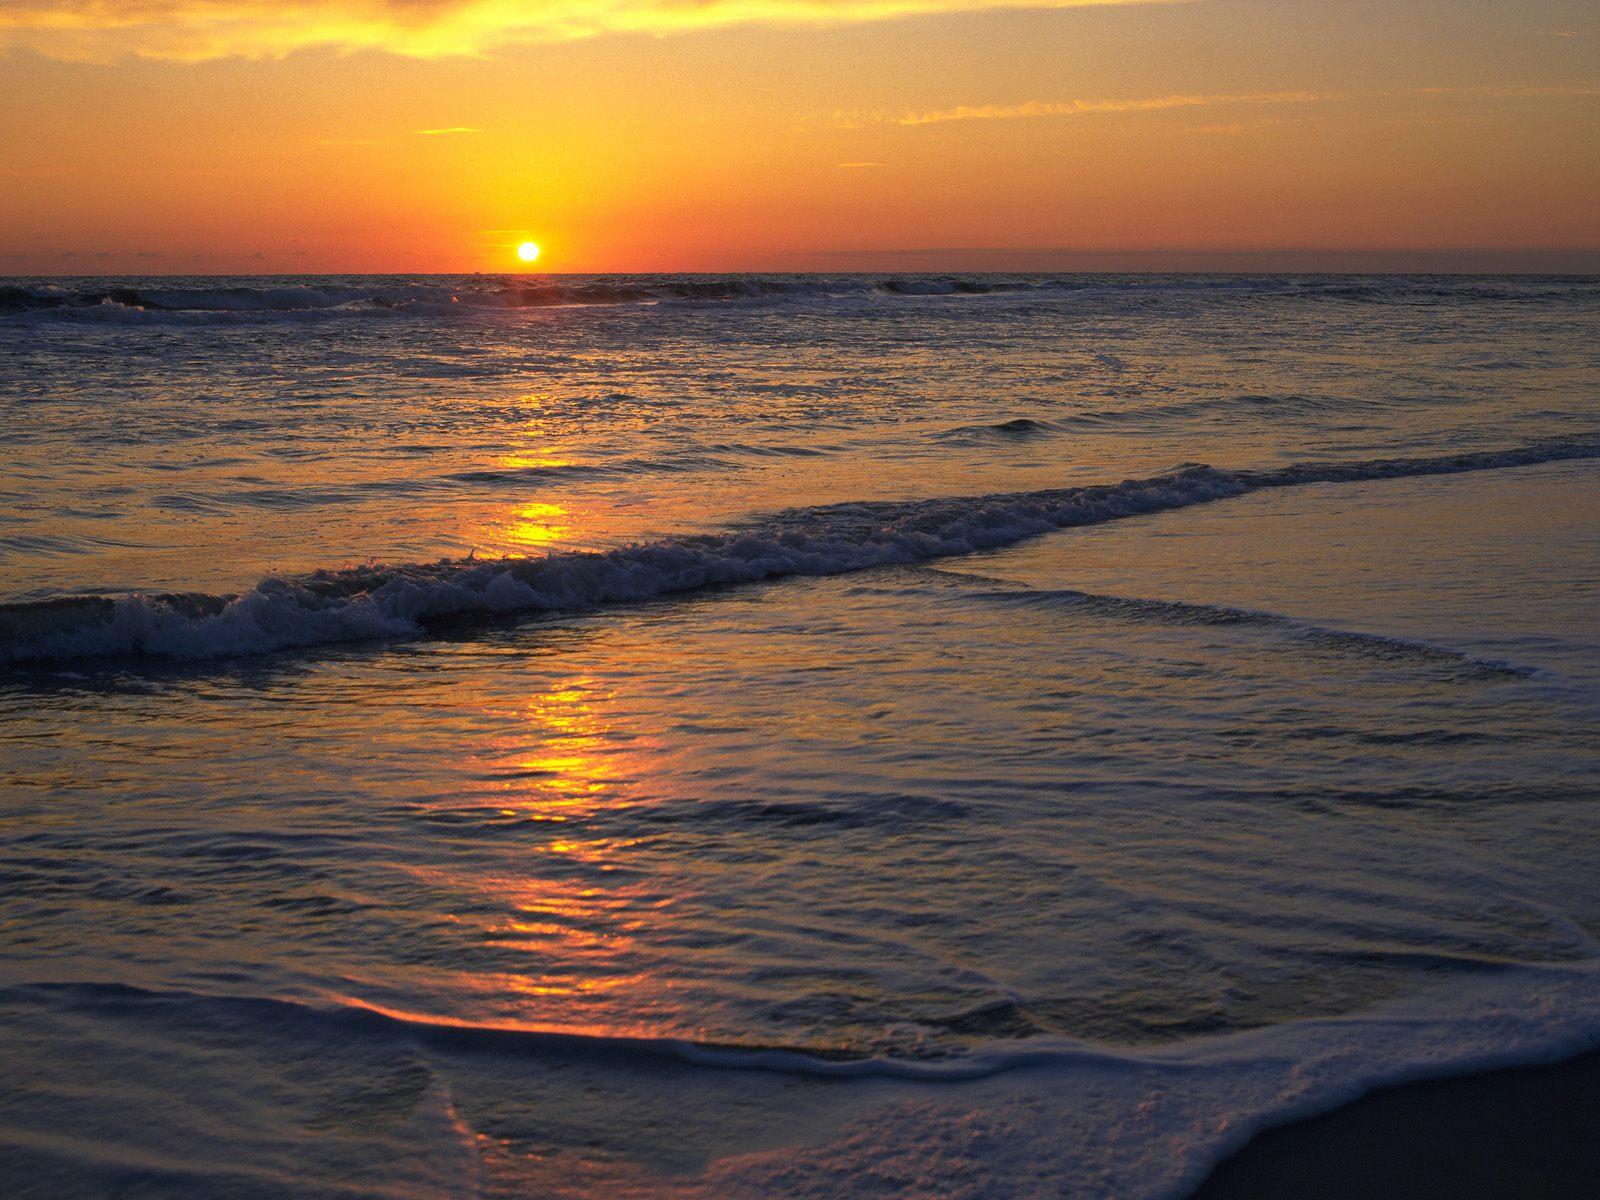 Atlantic Sunrise, Cape Hatteras National Seashore, North Carolina